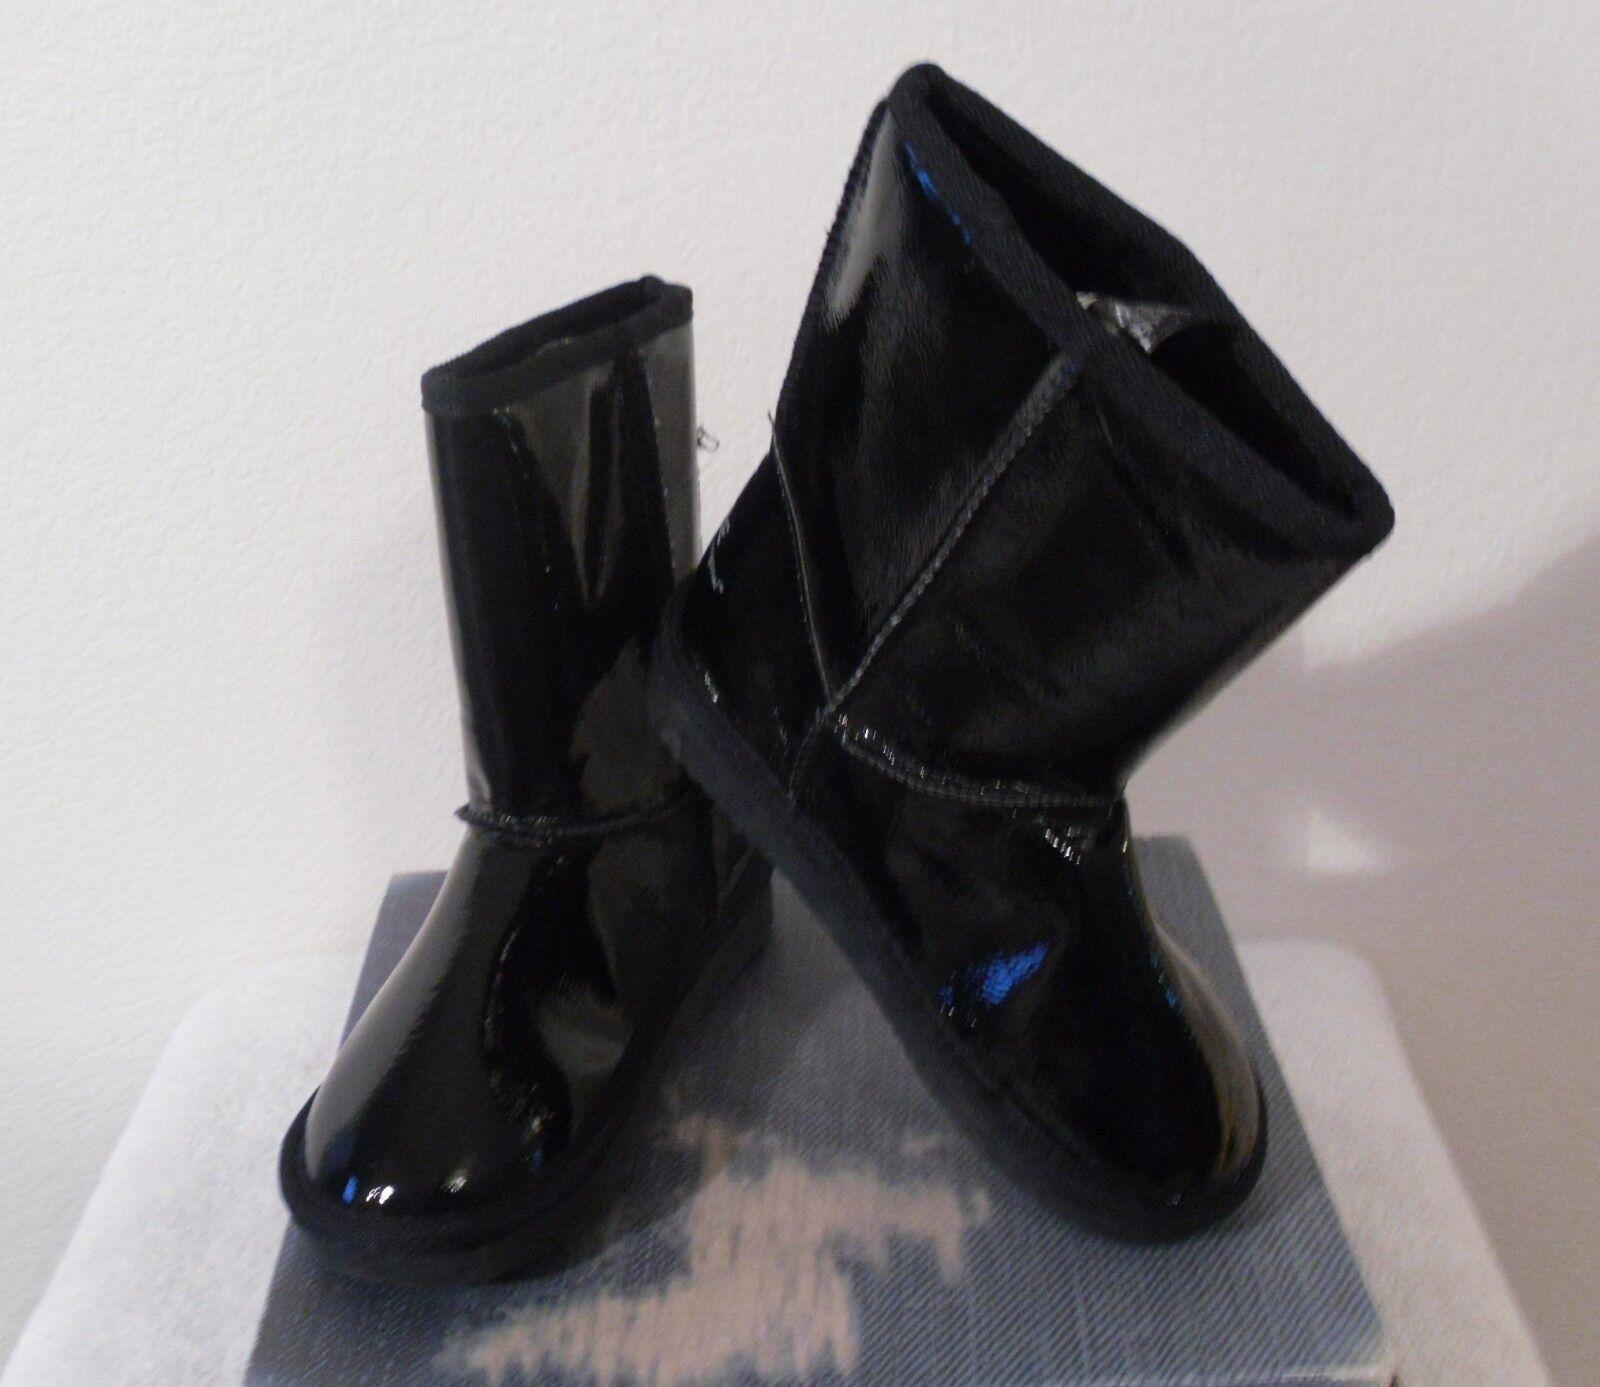 NIB Zodiac Tricia Girls Faux Shearling Lined Mid Calf Boots 5 Black MSRP$60